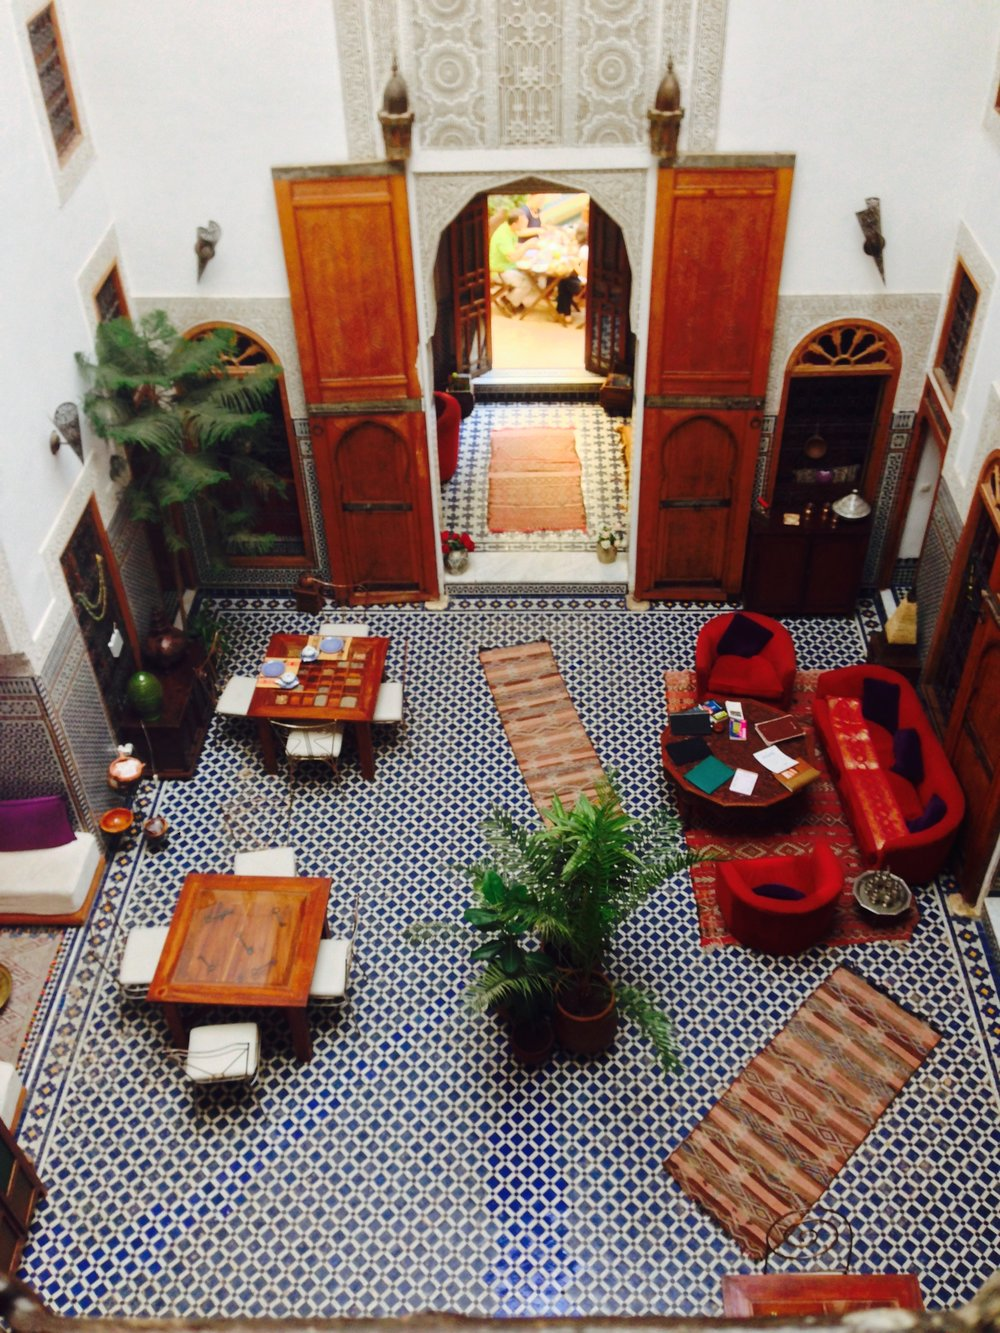 Riad in Fez, Morocco